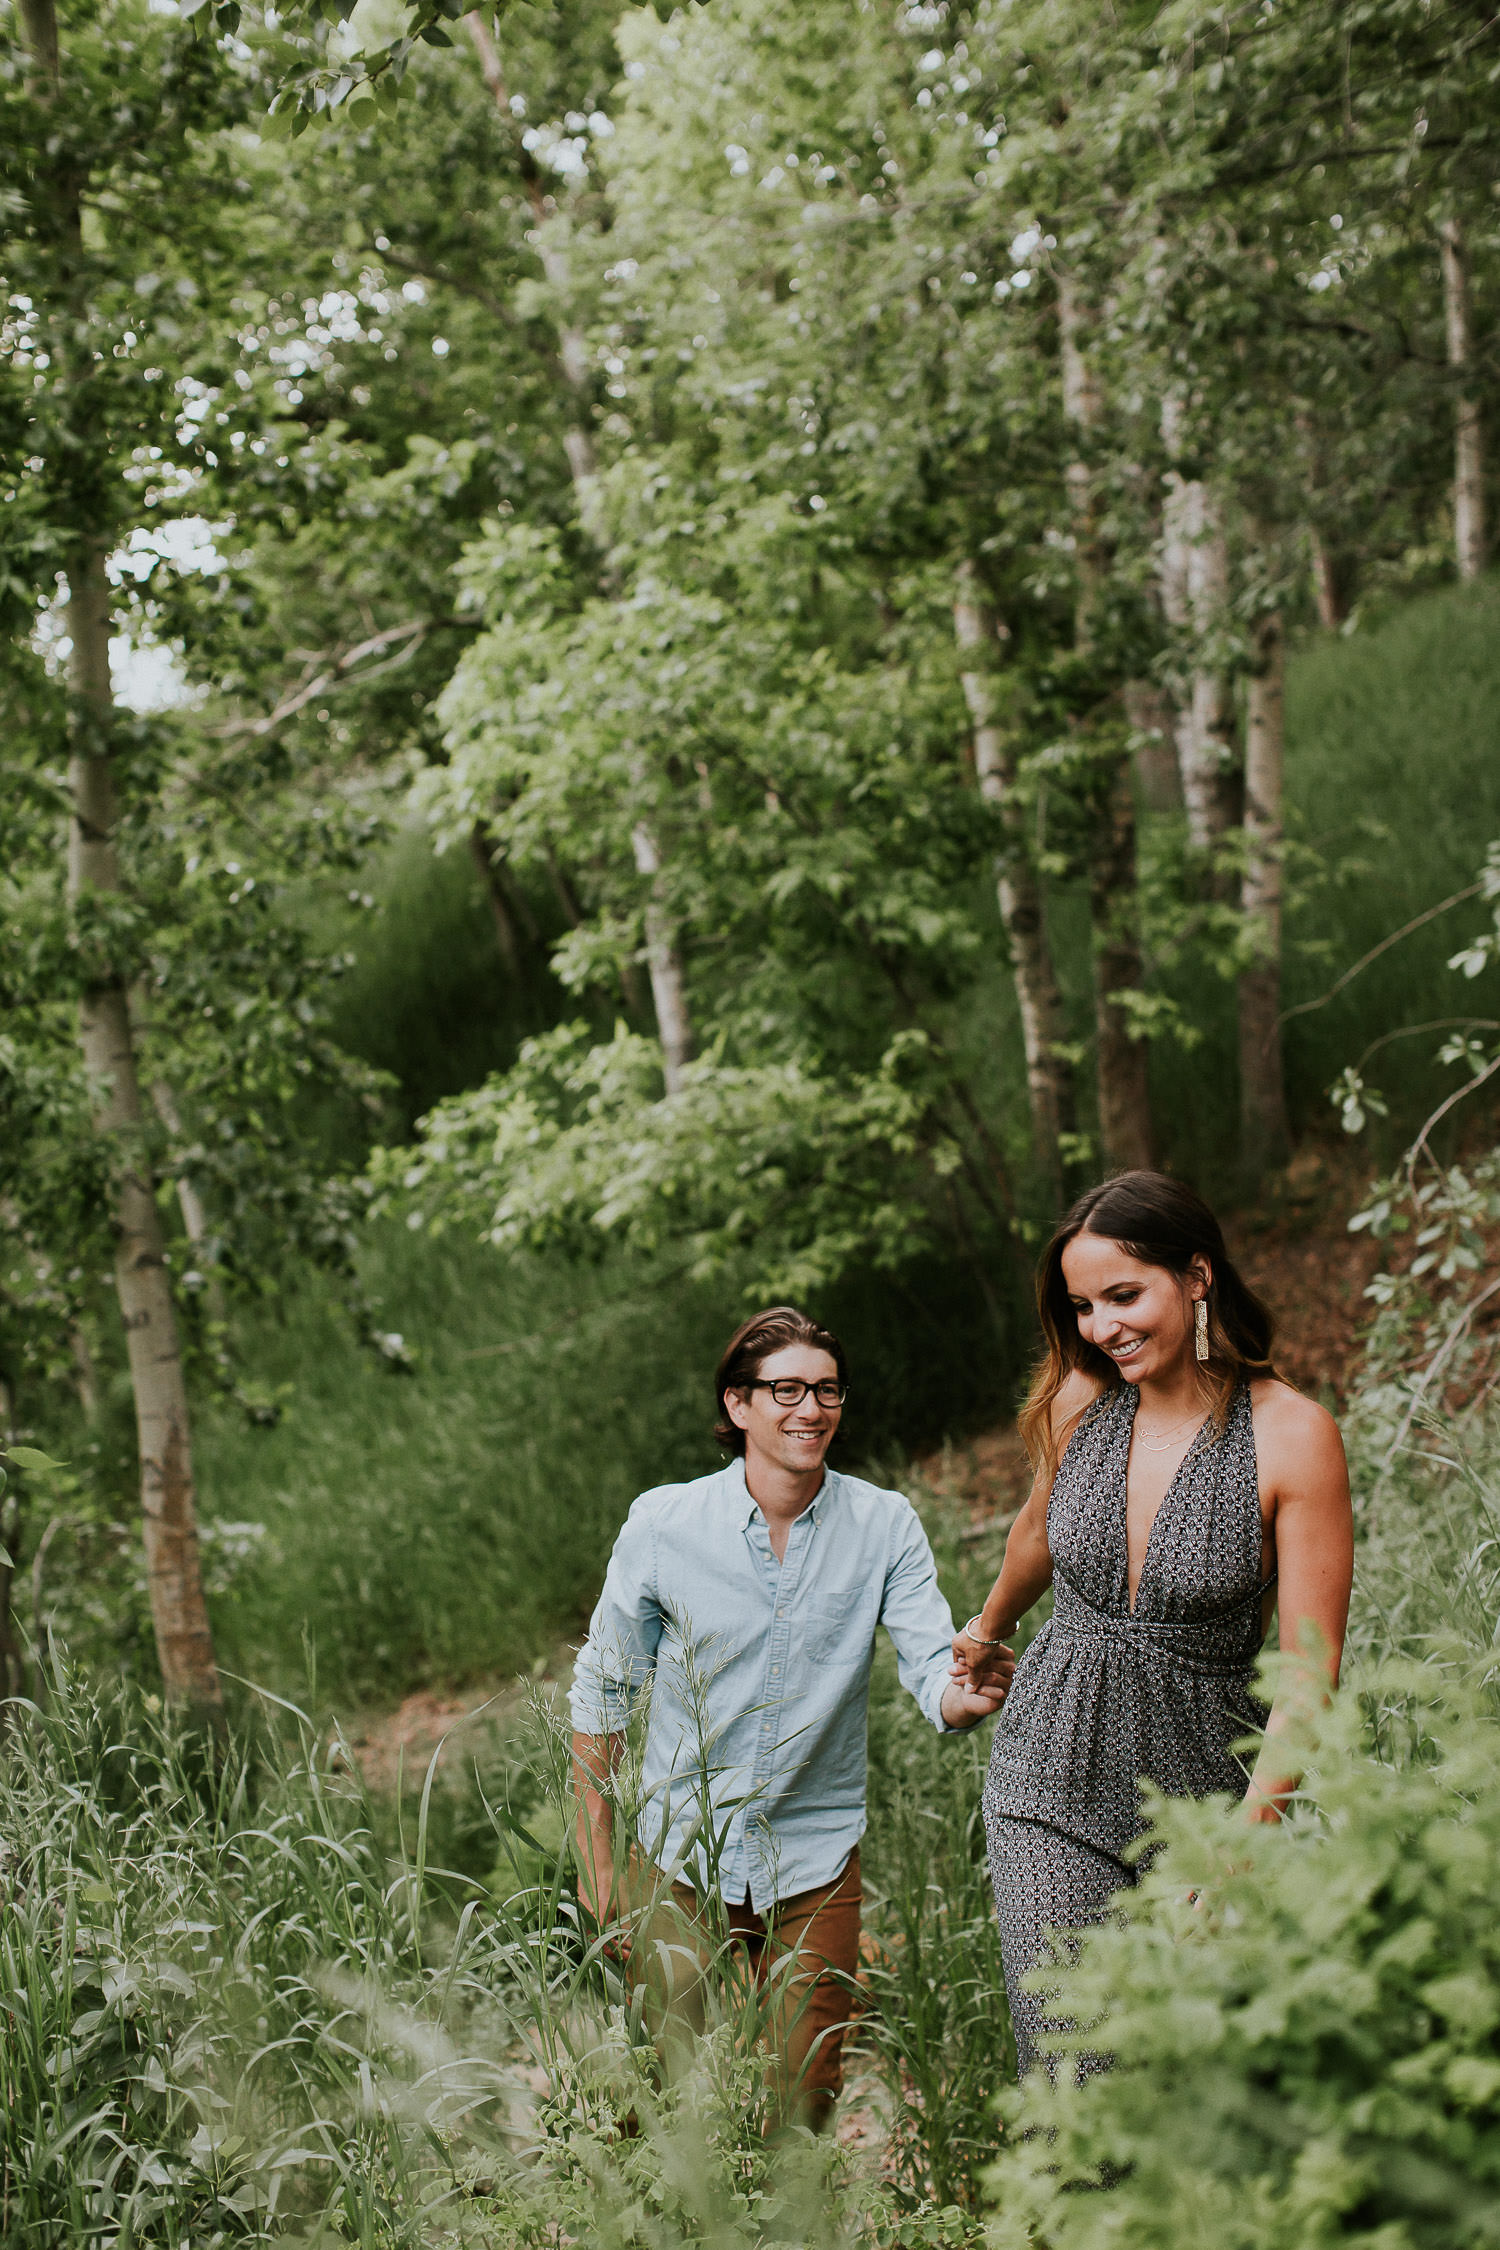 britney-and-danny-cute-bridgeland-engagement-photos-in-calgary-sarah-pukin-0017